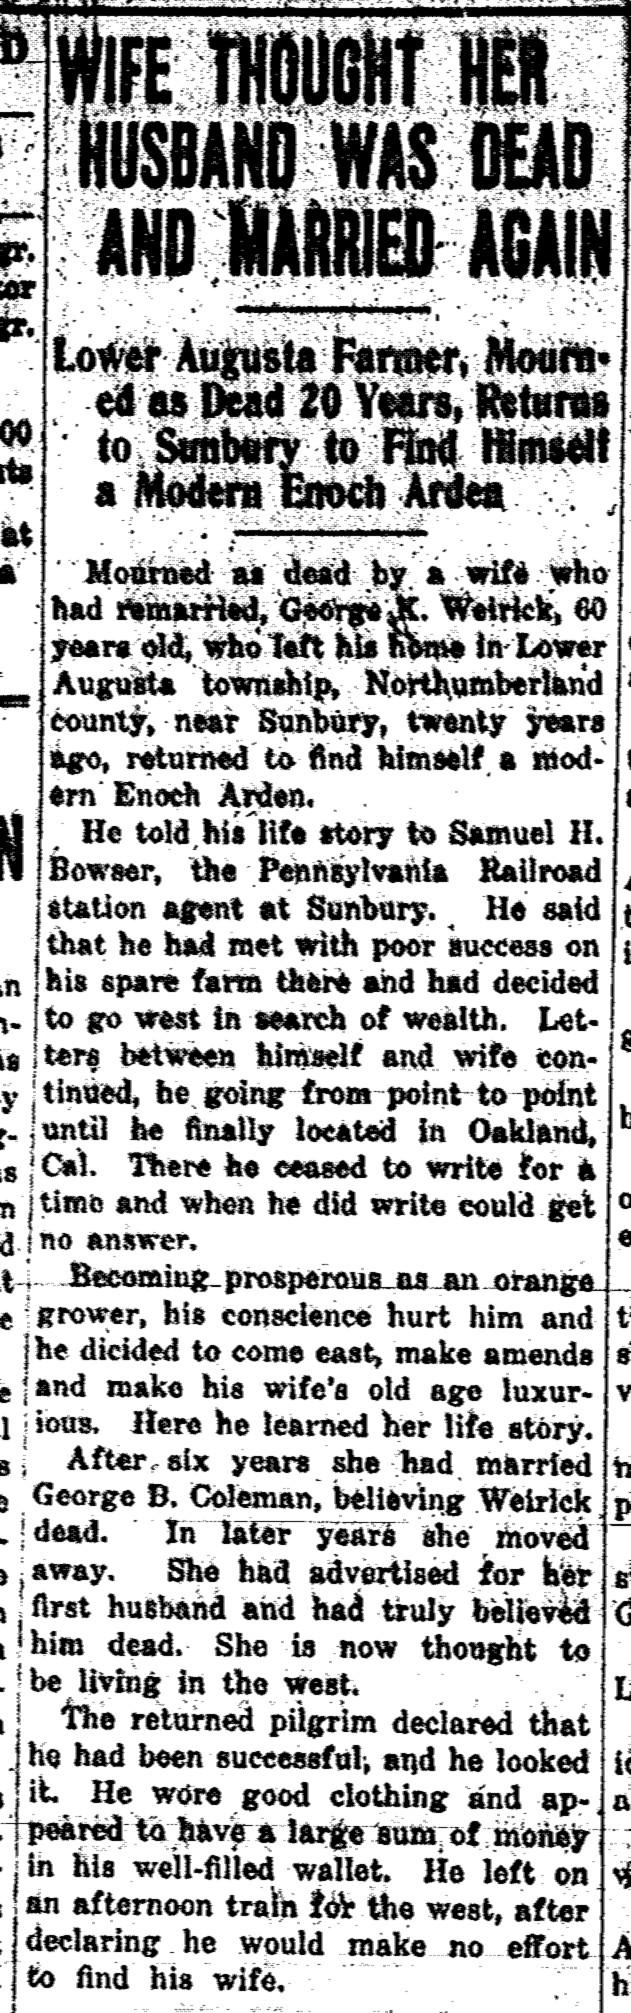 Source: Milton Evening Standard (November 19, 1914